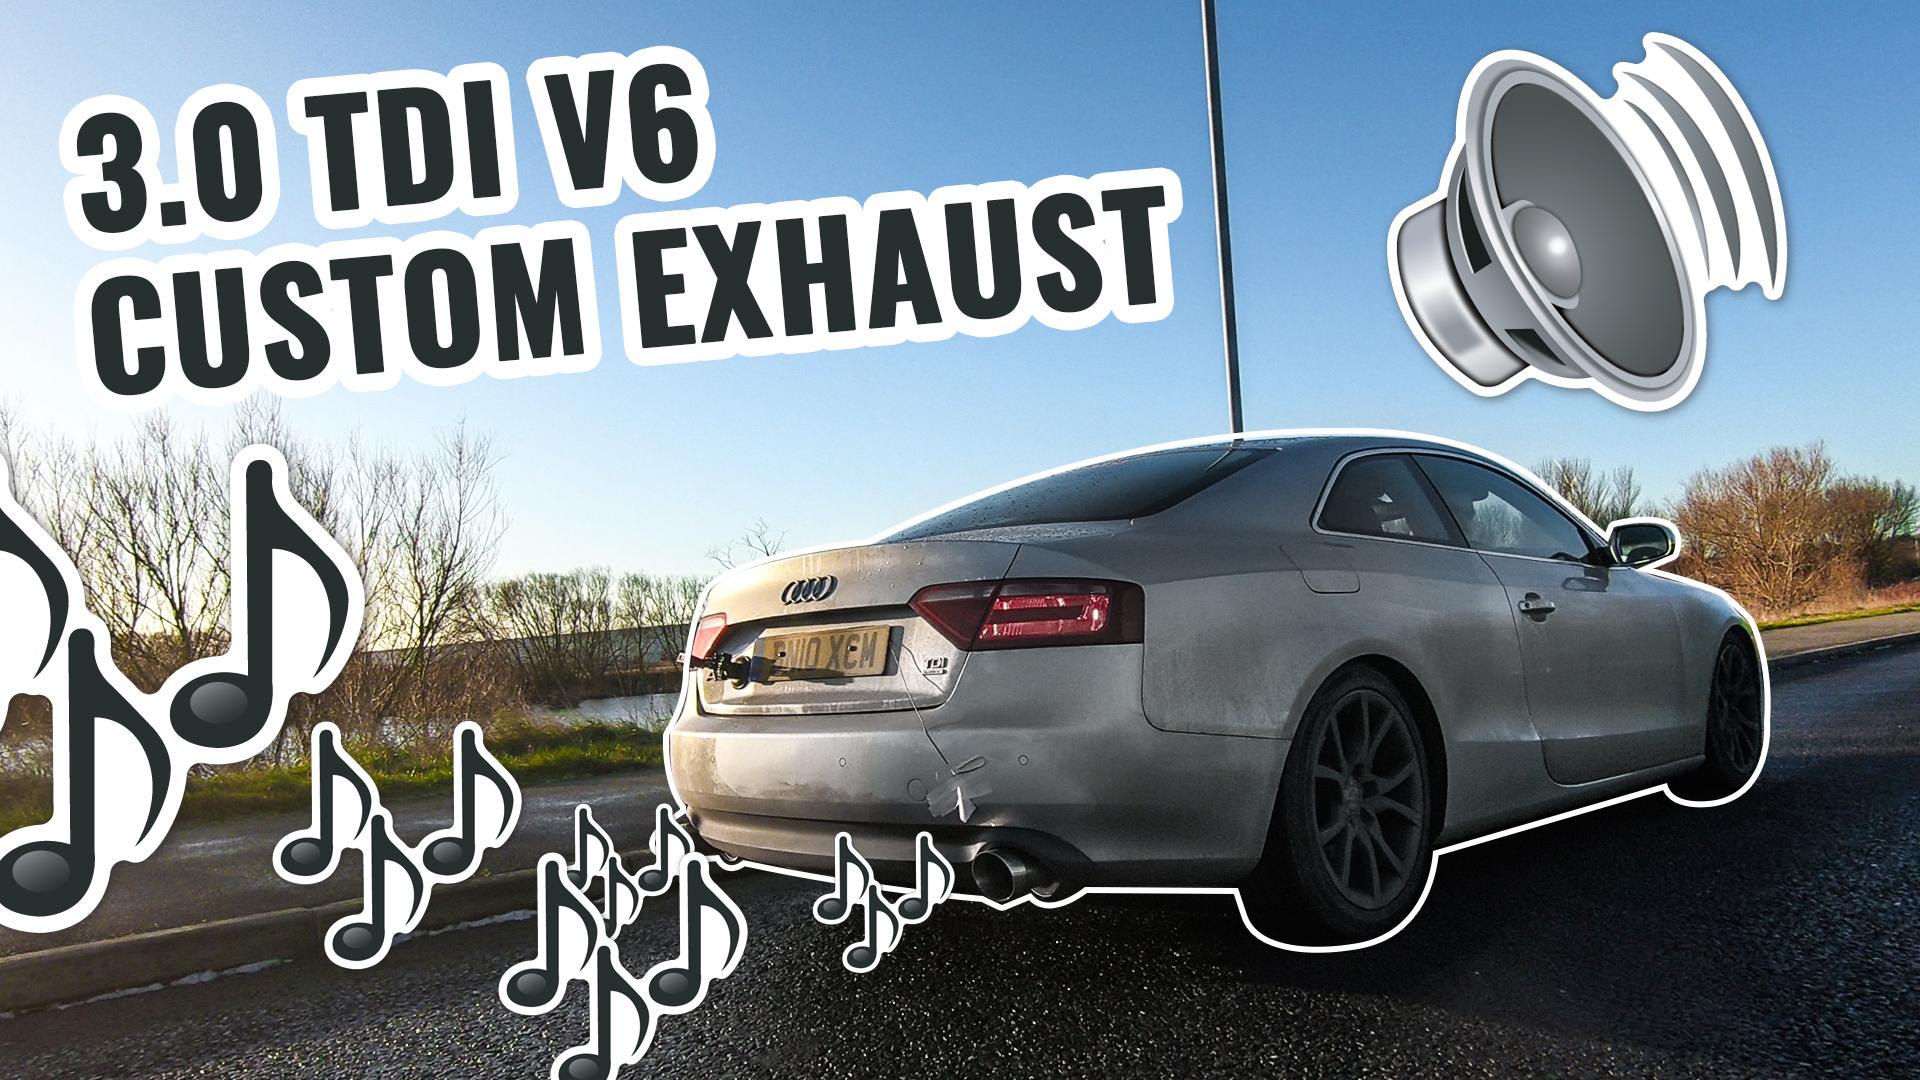 V6 TDI CUSTOM EXHAUST! - AUDI A5 3 0 TDI QUATTRO PROJECT